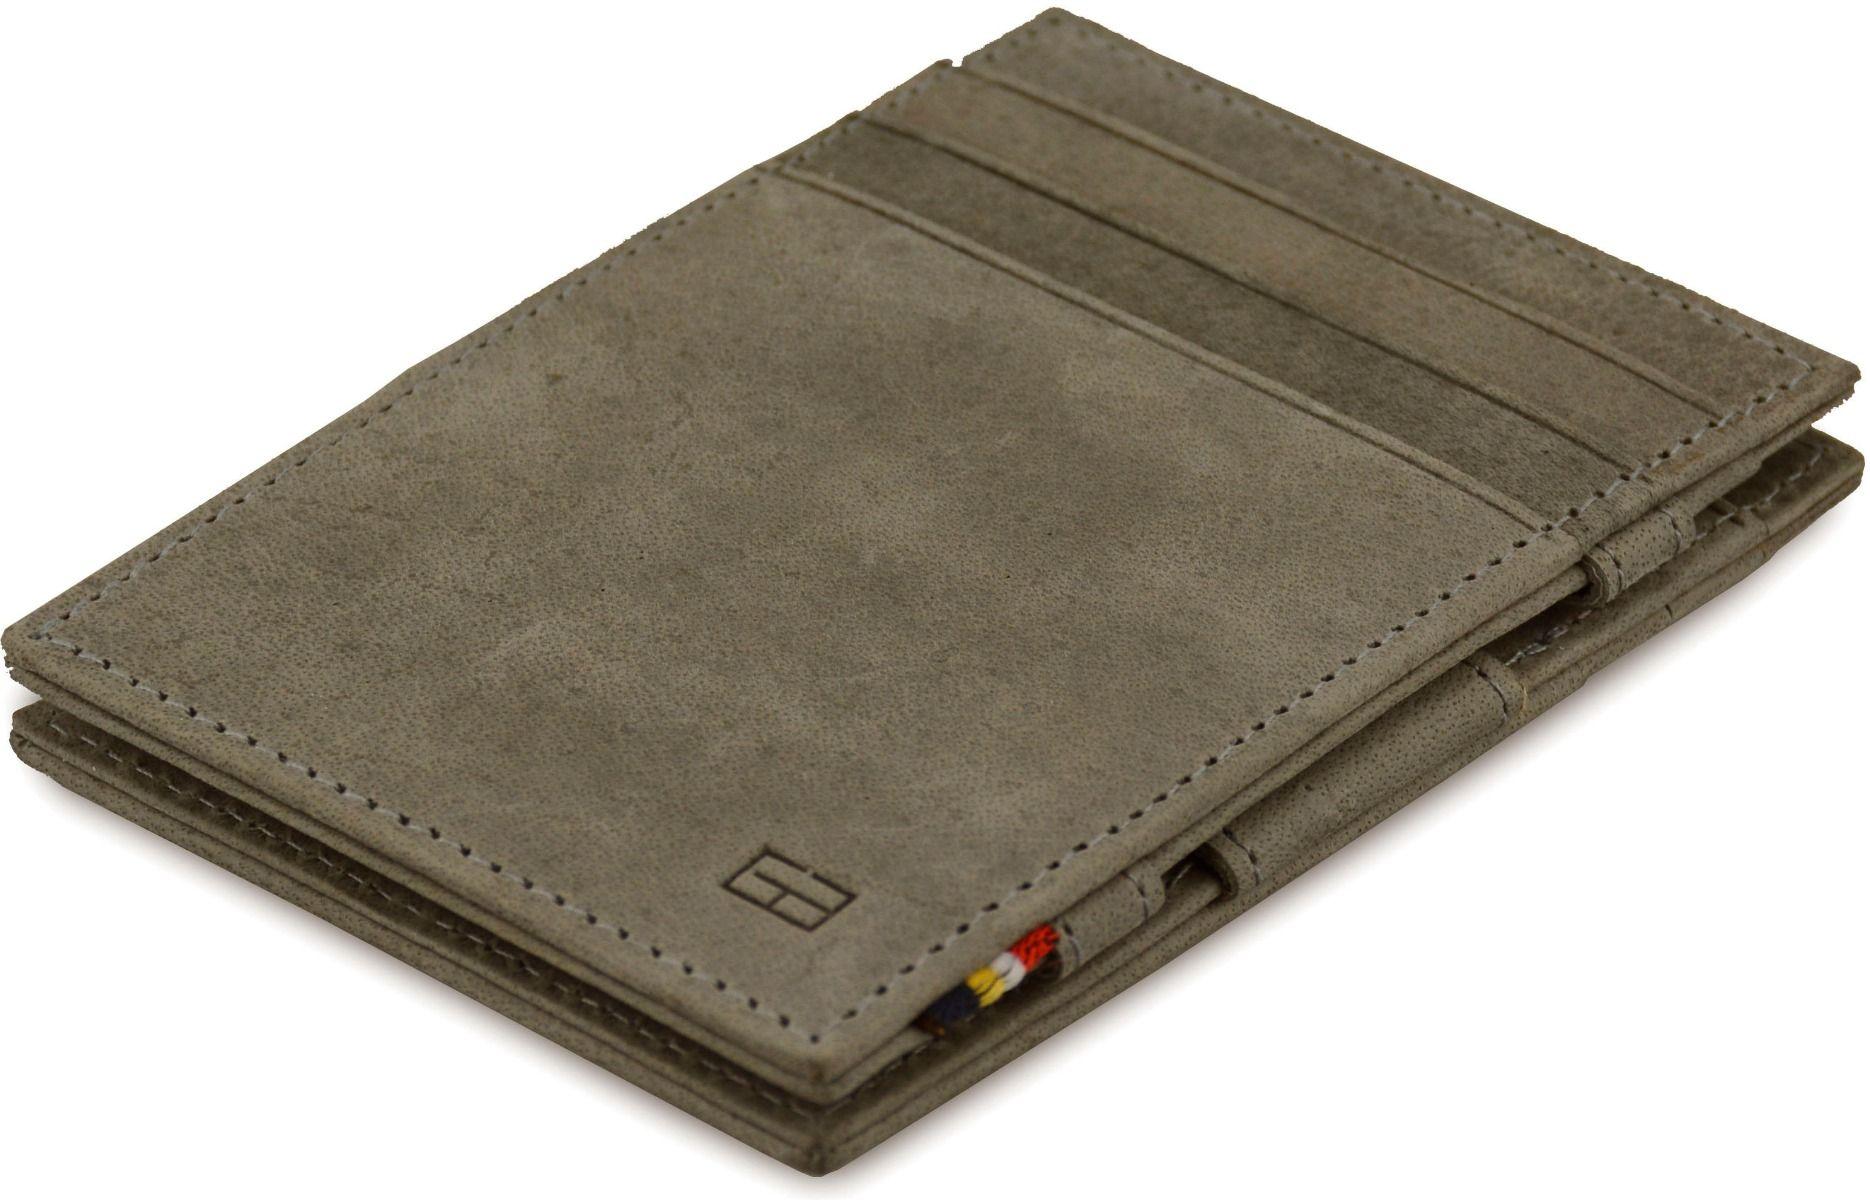 Garzini Essenziale Magic Wallet MW-CS1-MG